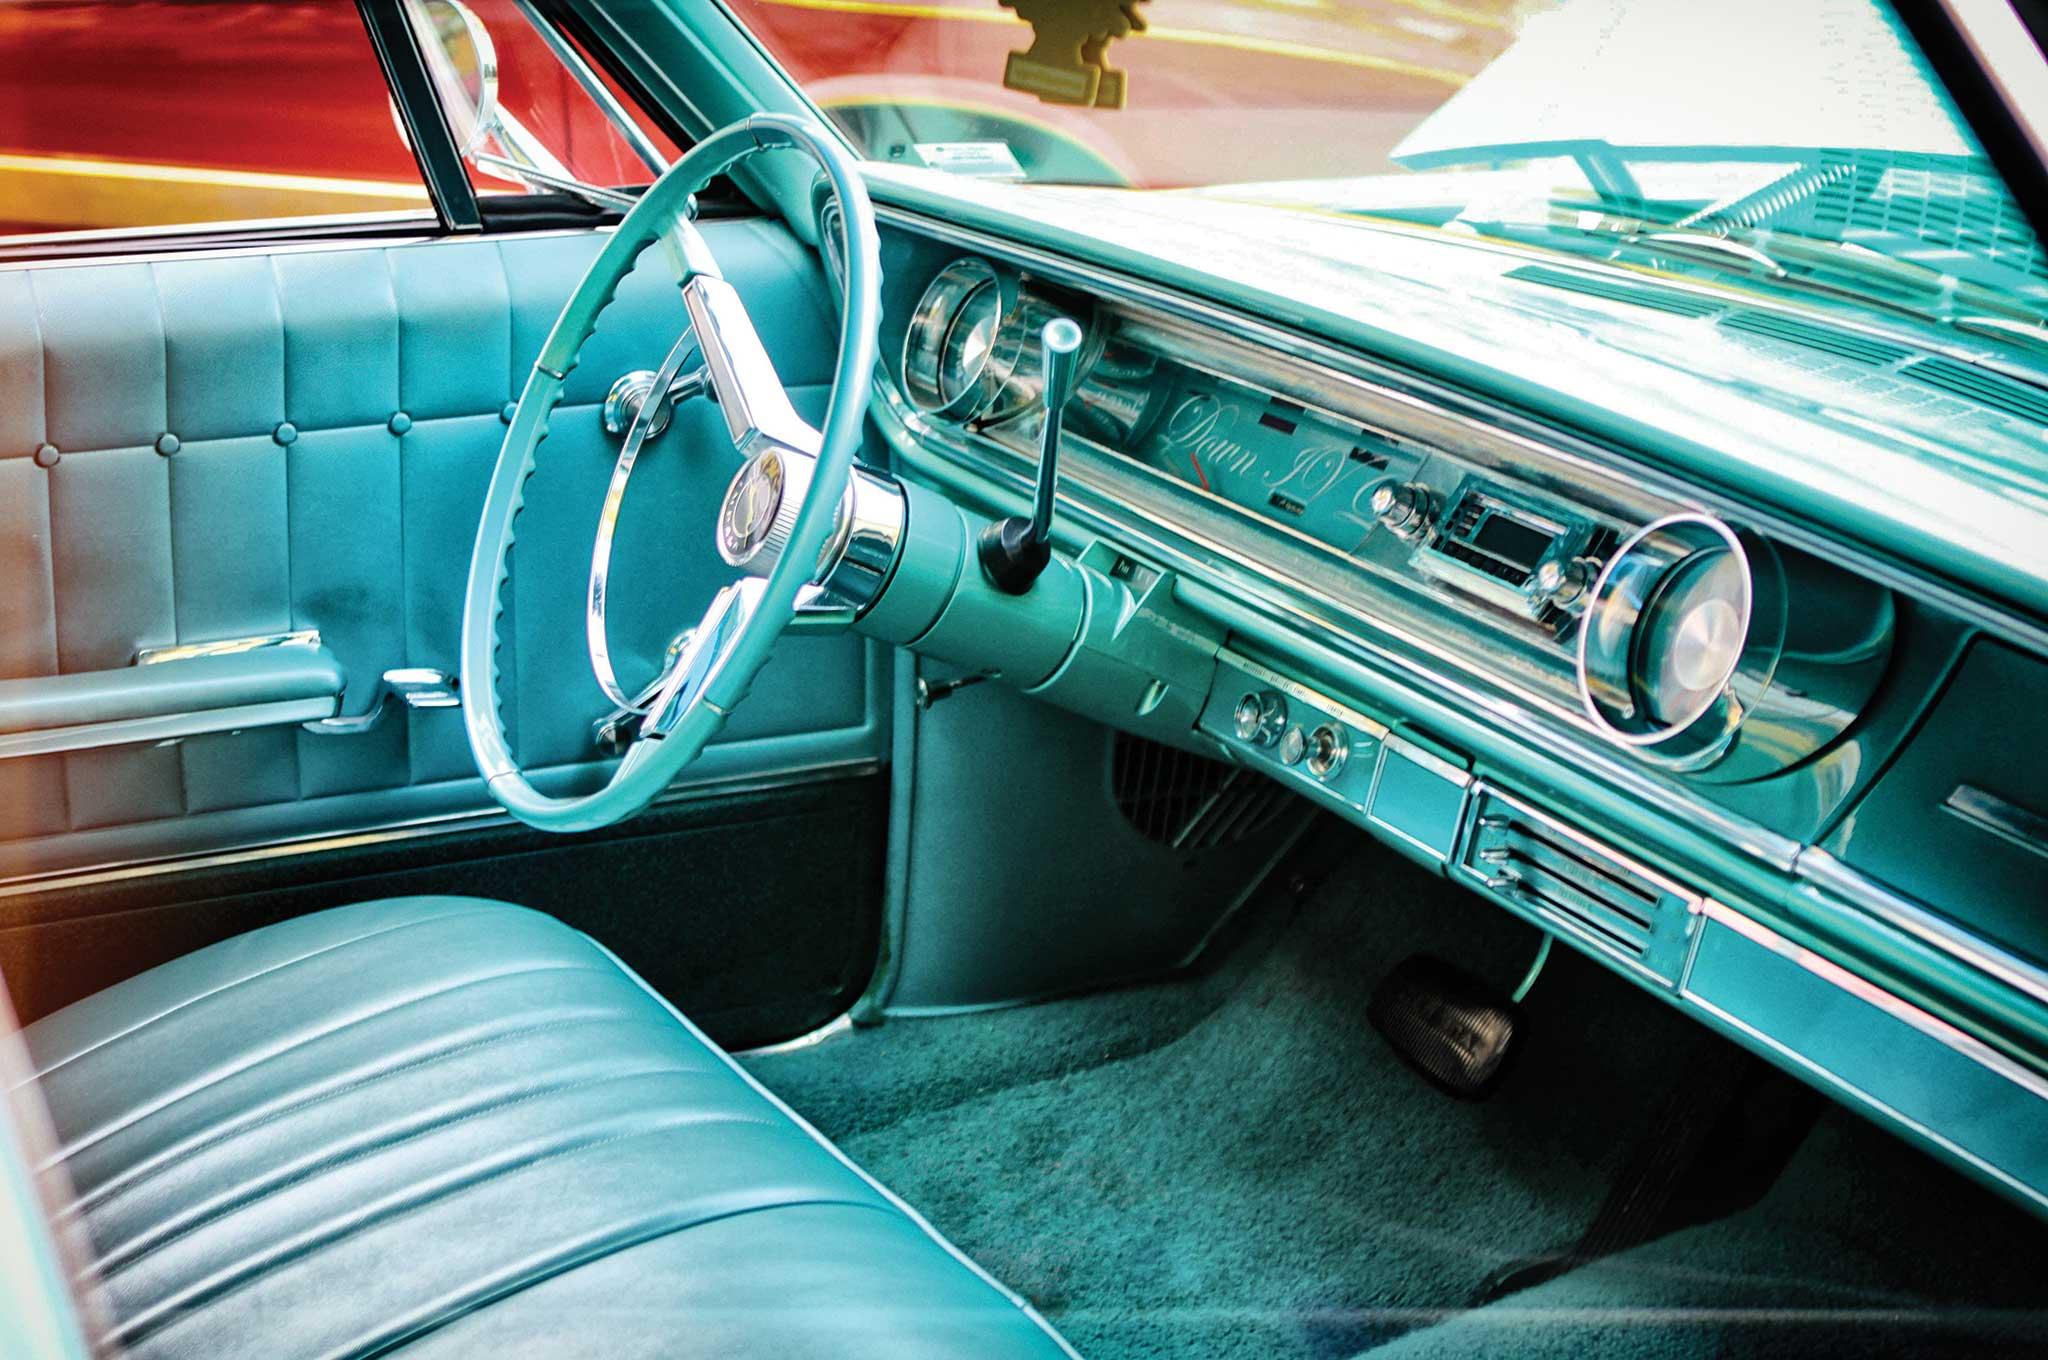 6 Wheel G Wagon >> 1965 Chevrolet Impala Wagon - Outside the Box - Lowrider